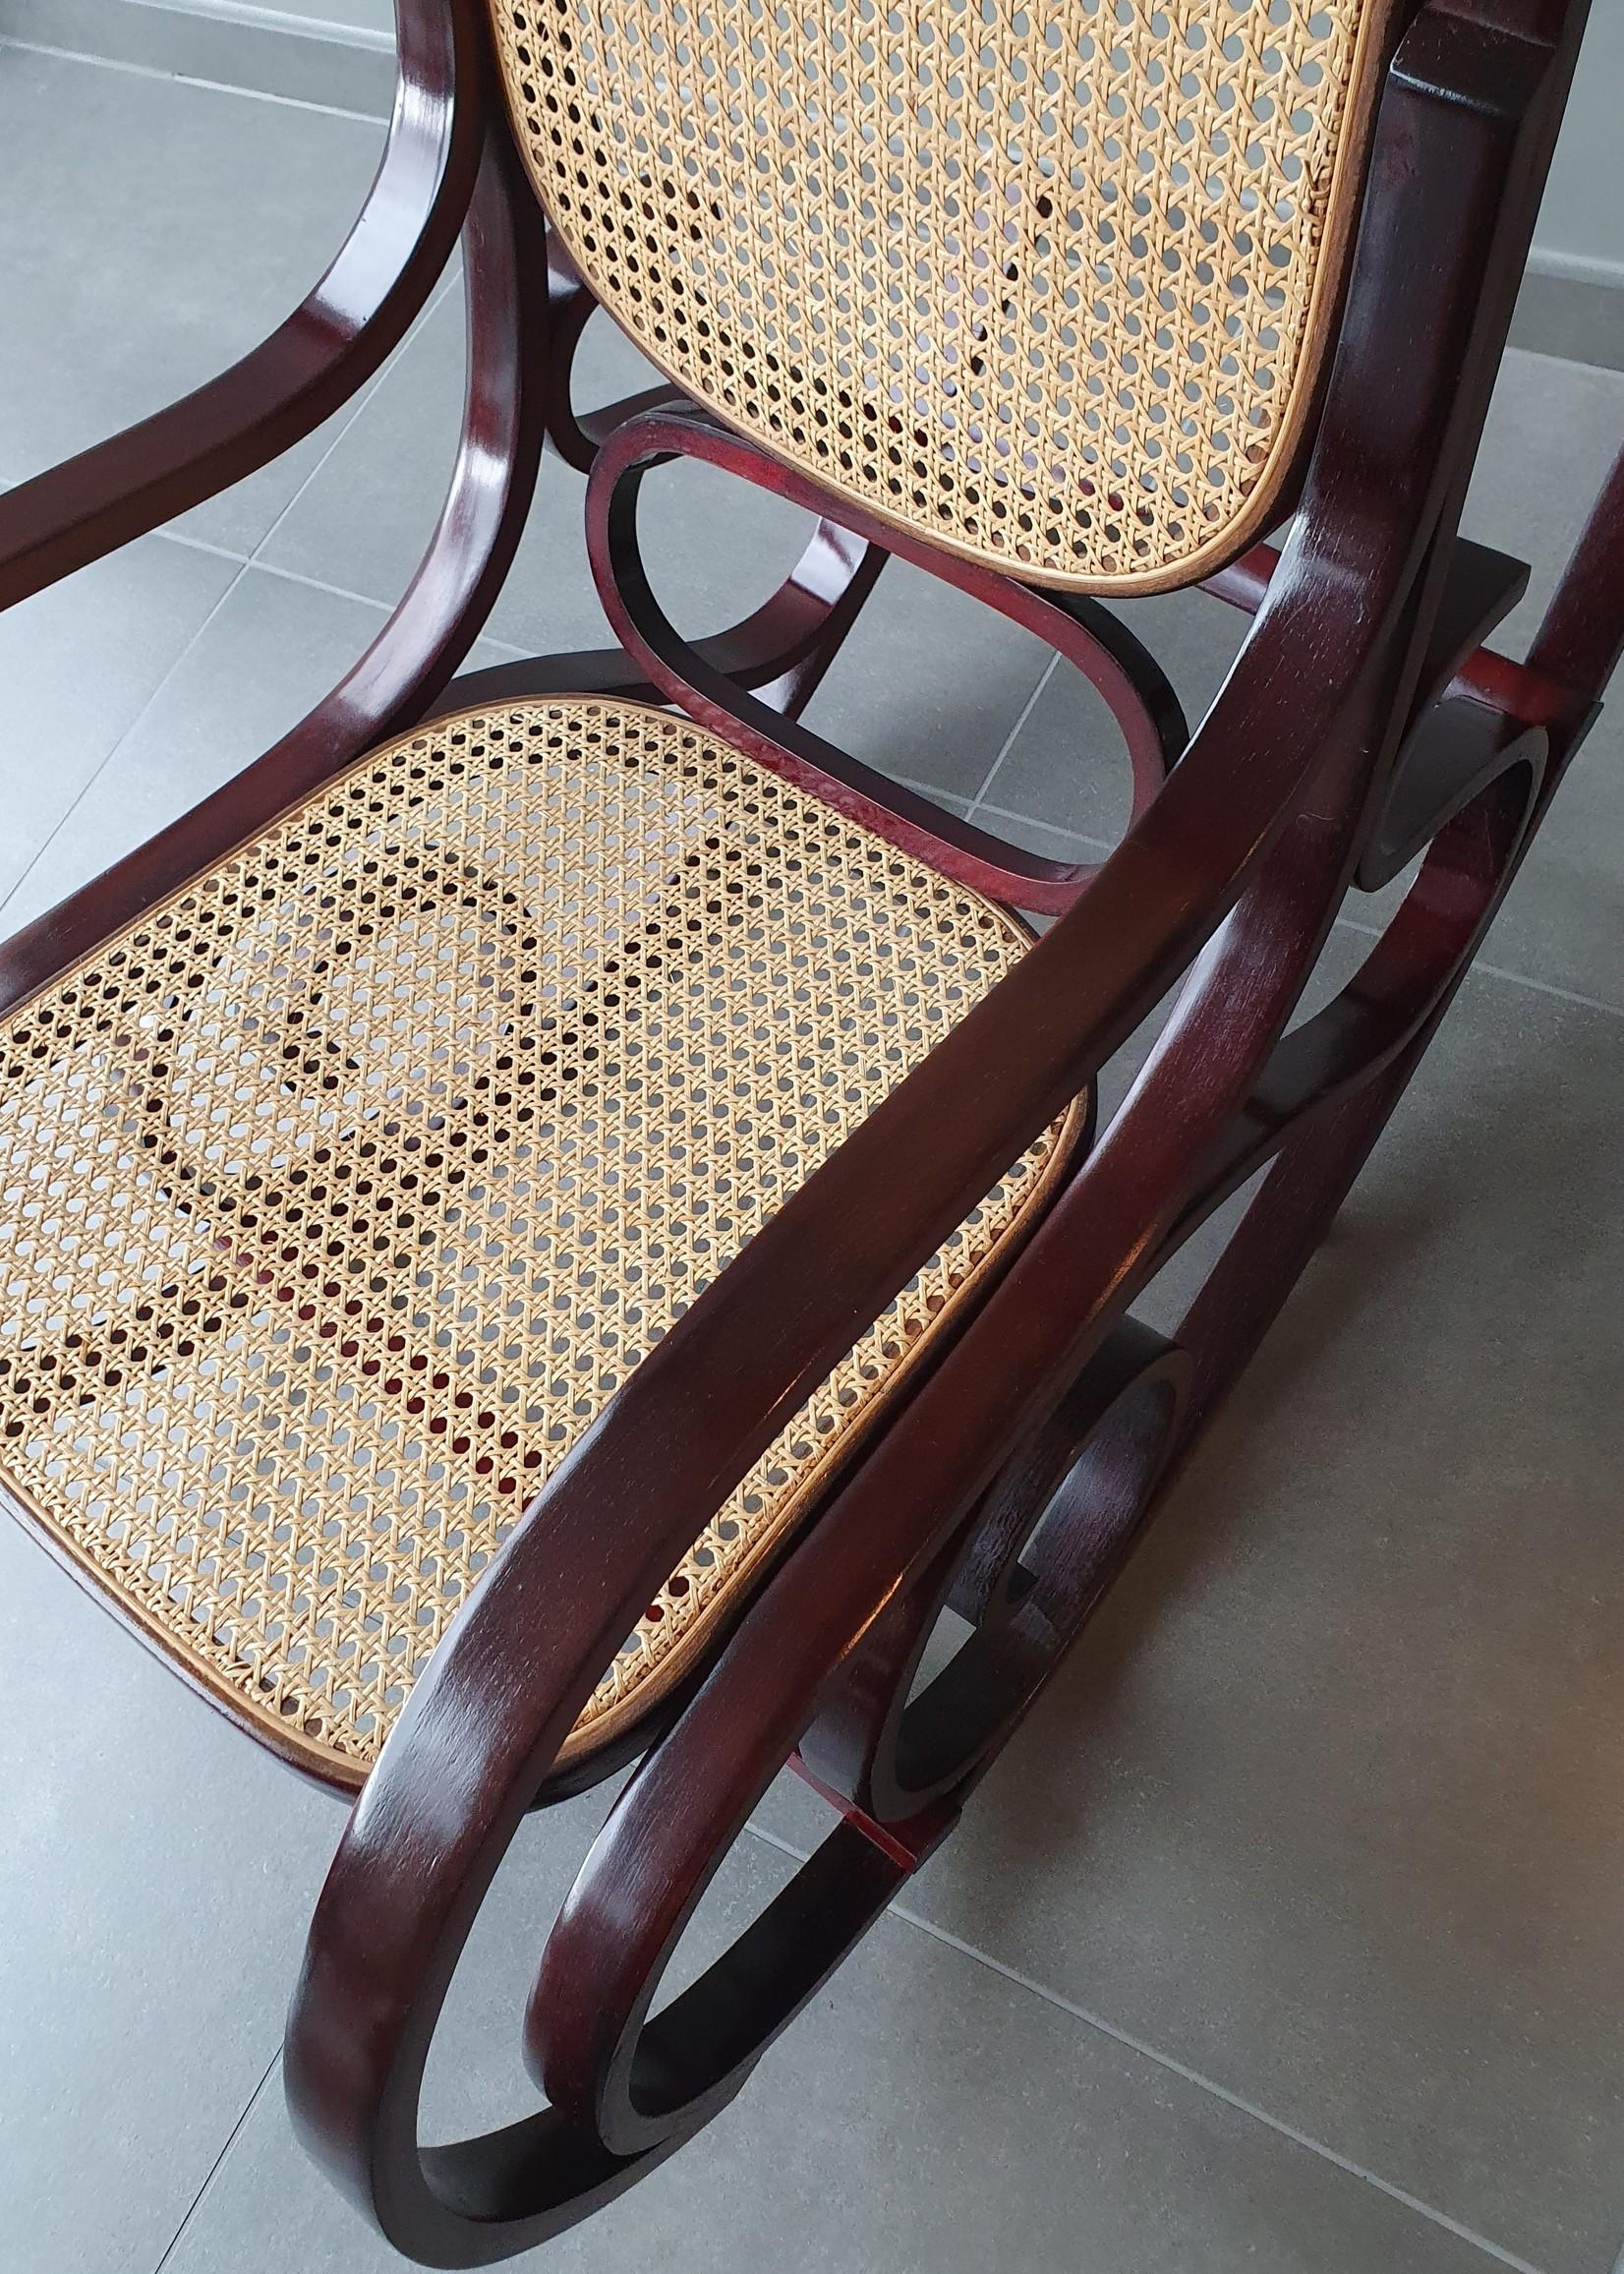 Vintage rocking chair Thonet style, tweede helft  20e eeuw